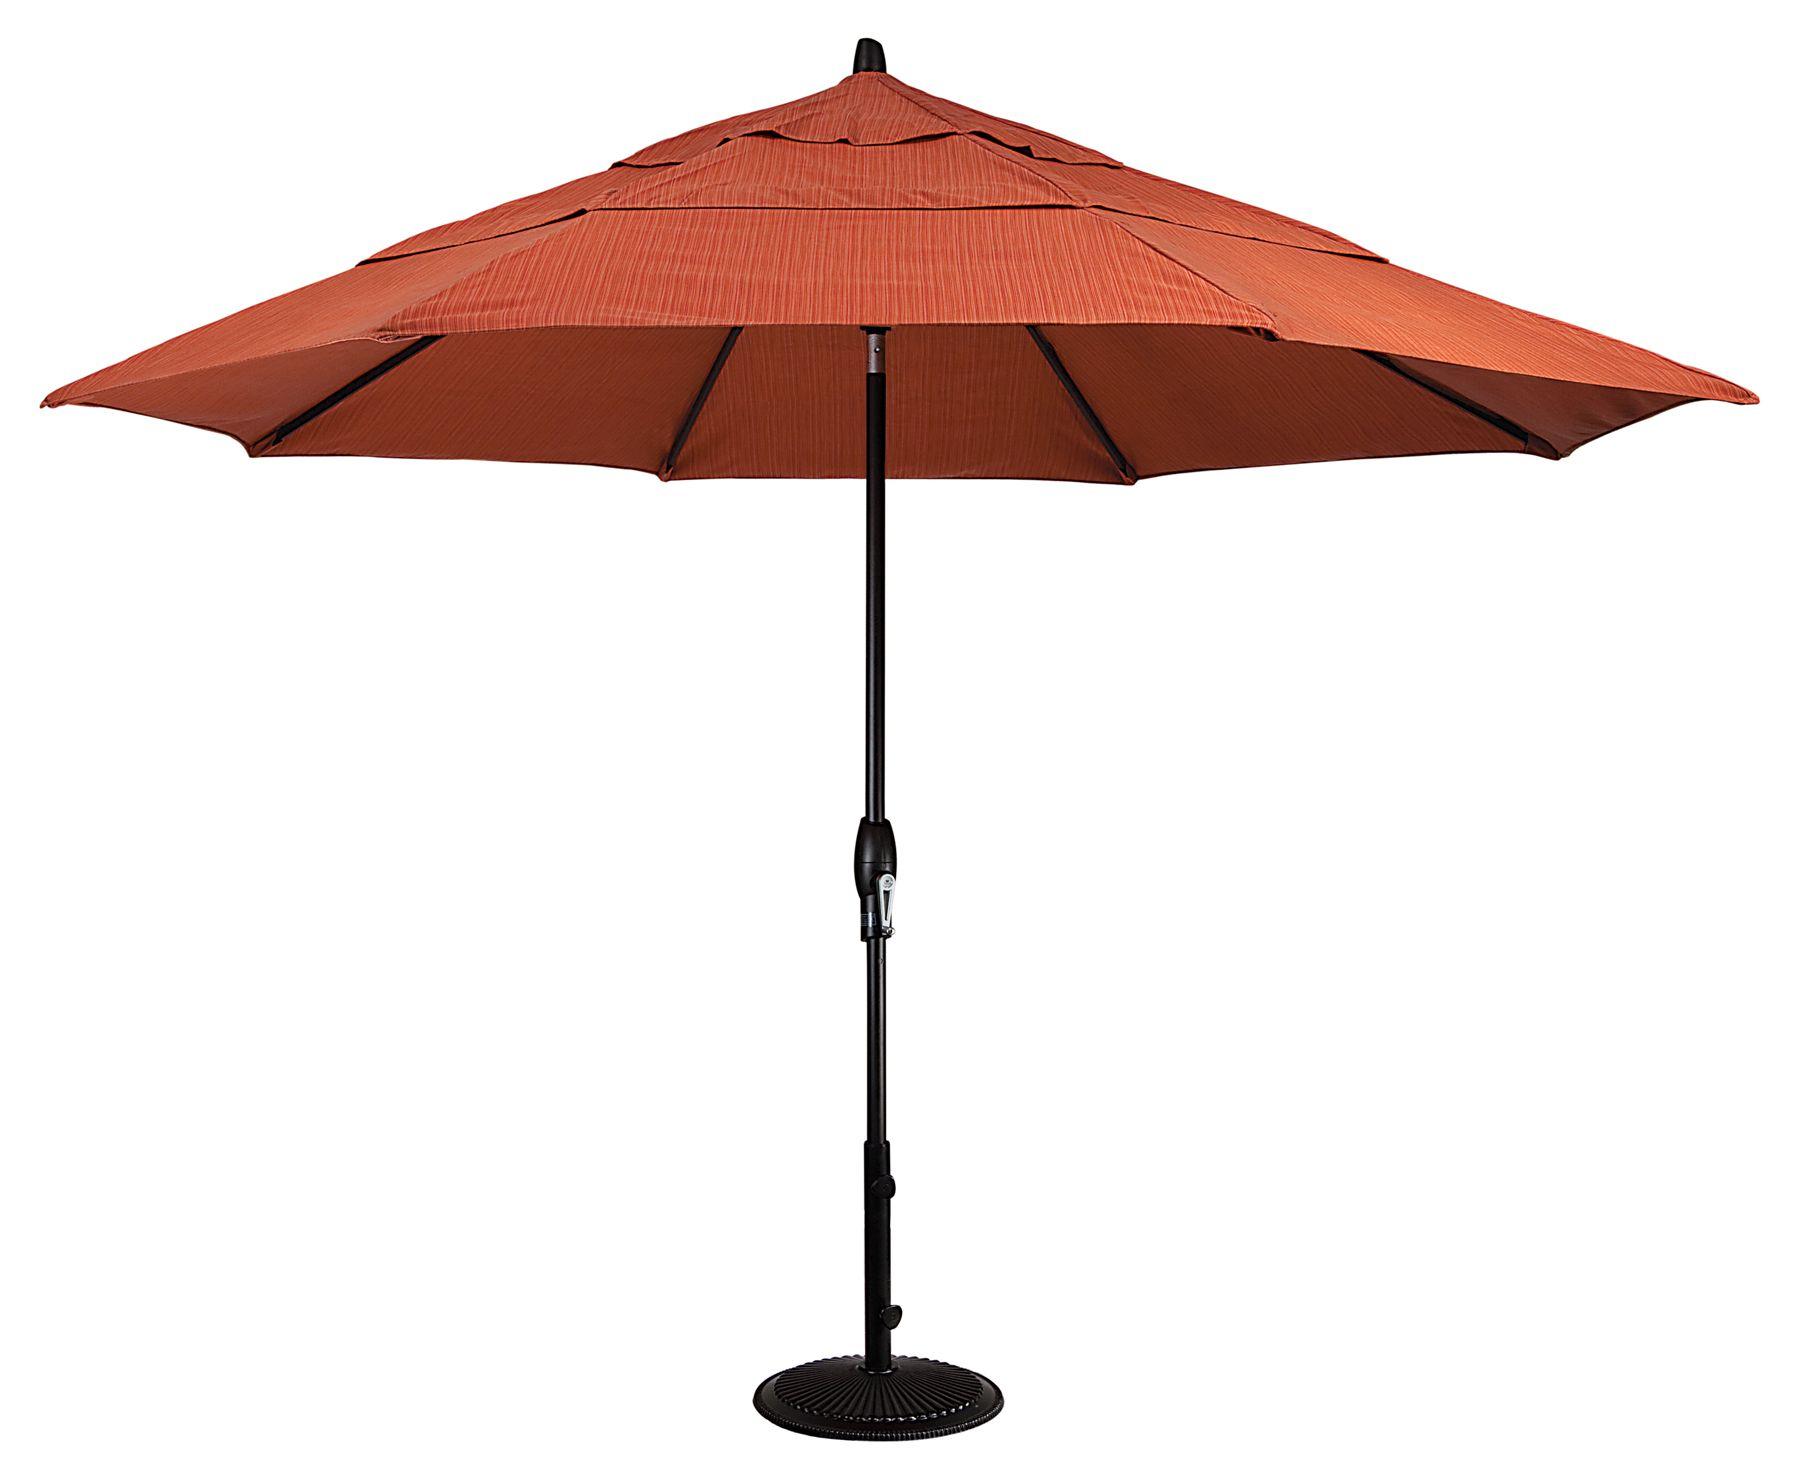 Treasure Garden The World S Favorite Shade Patio Umbrellas Market Umbrella Patio Umbrella What is a market umbrella